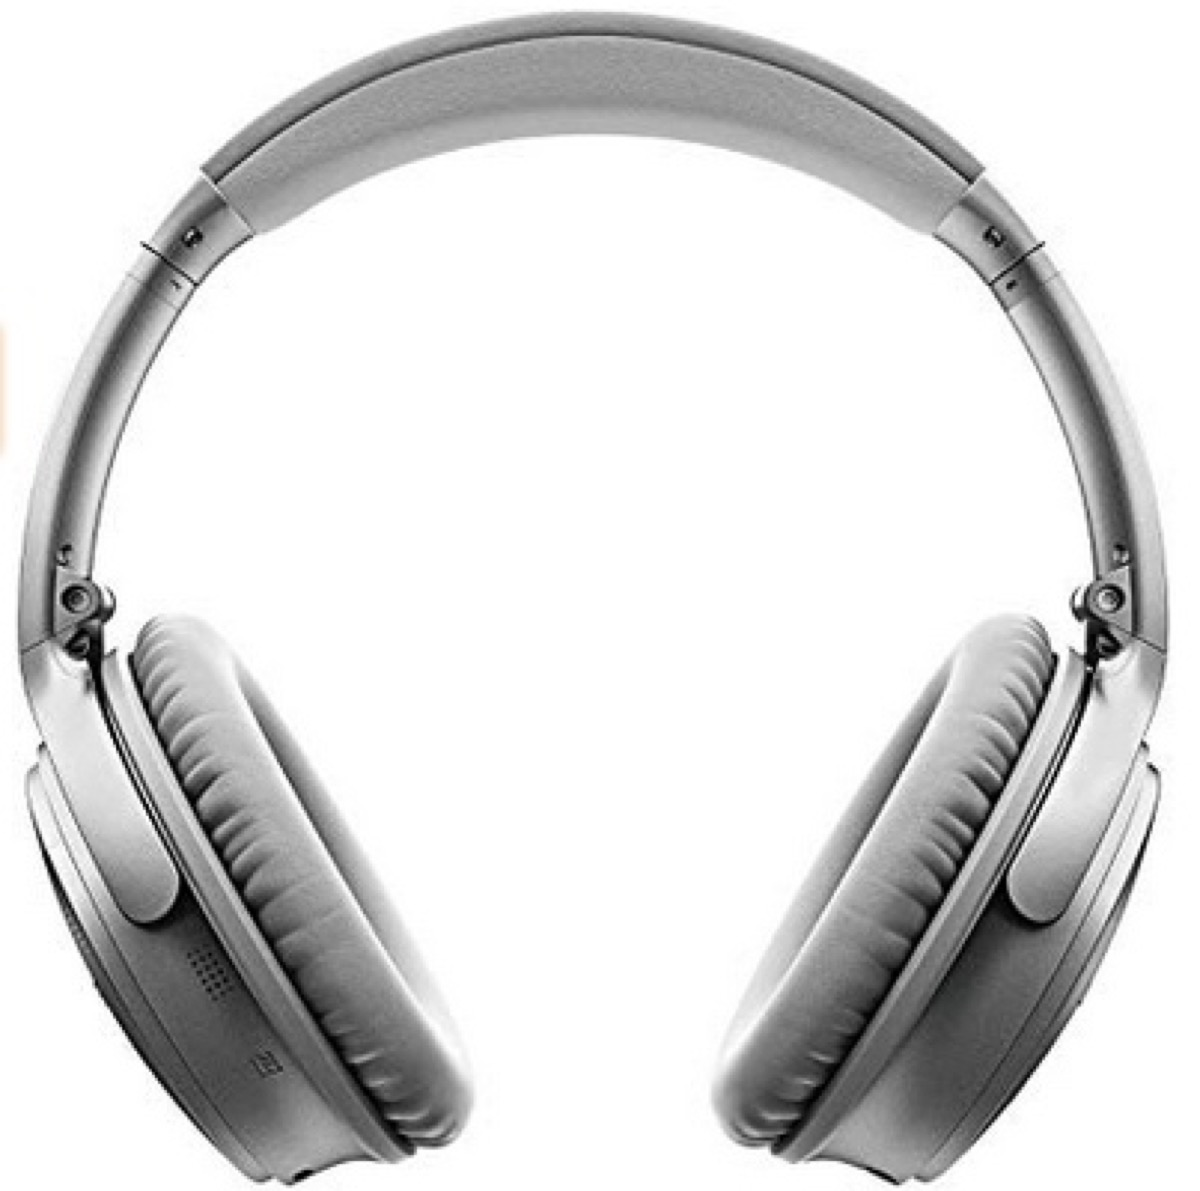 gray over the ear noise canceling headphones